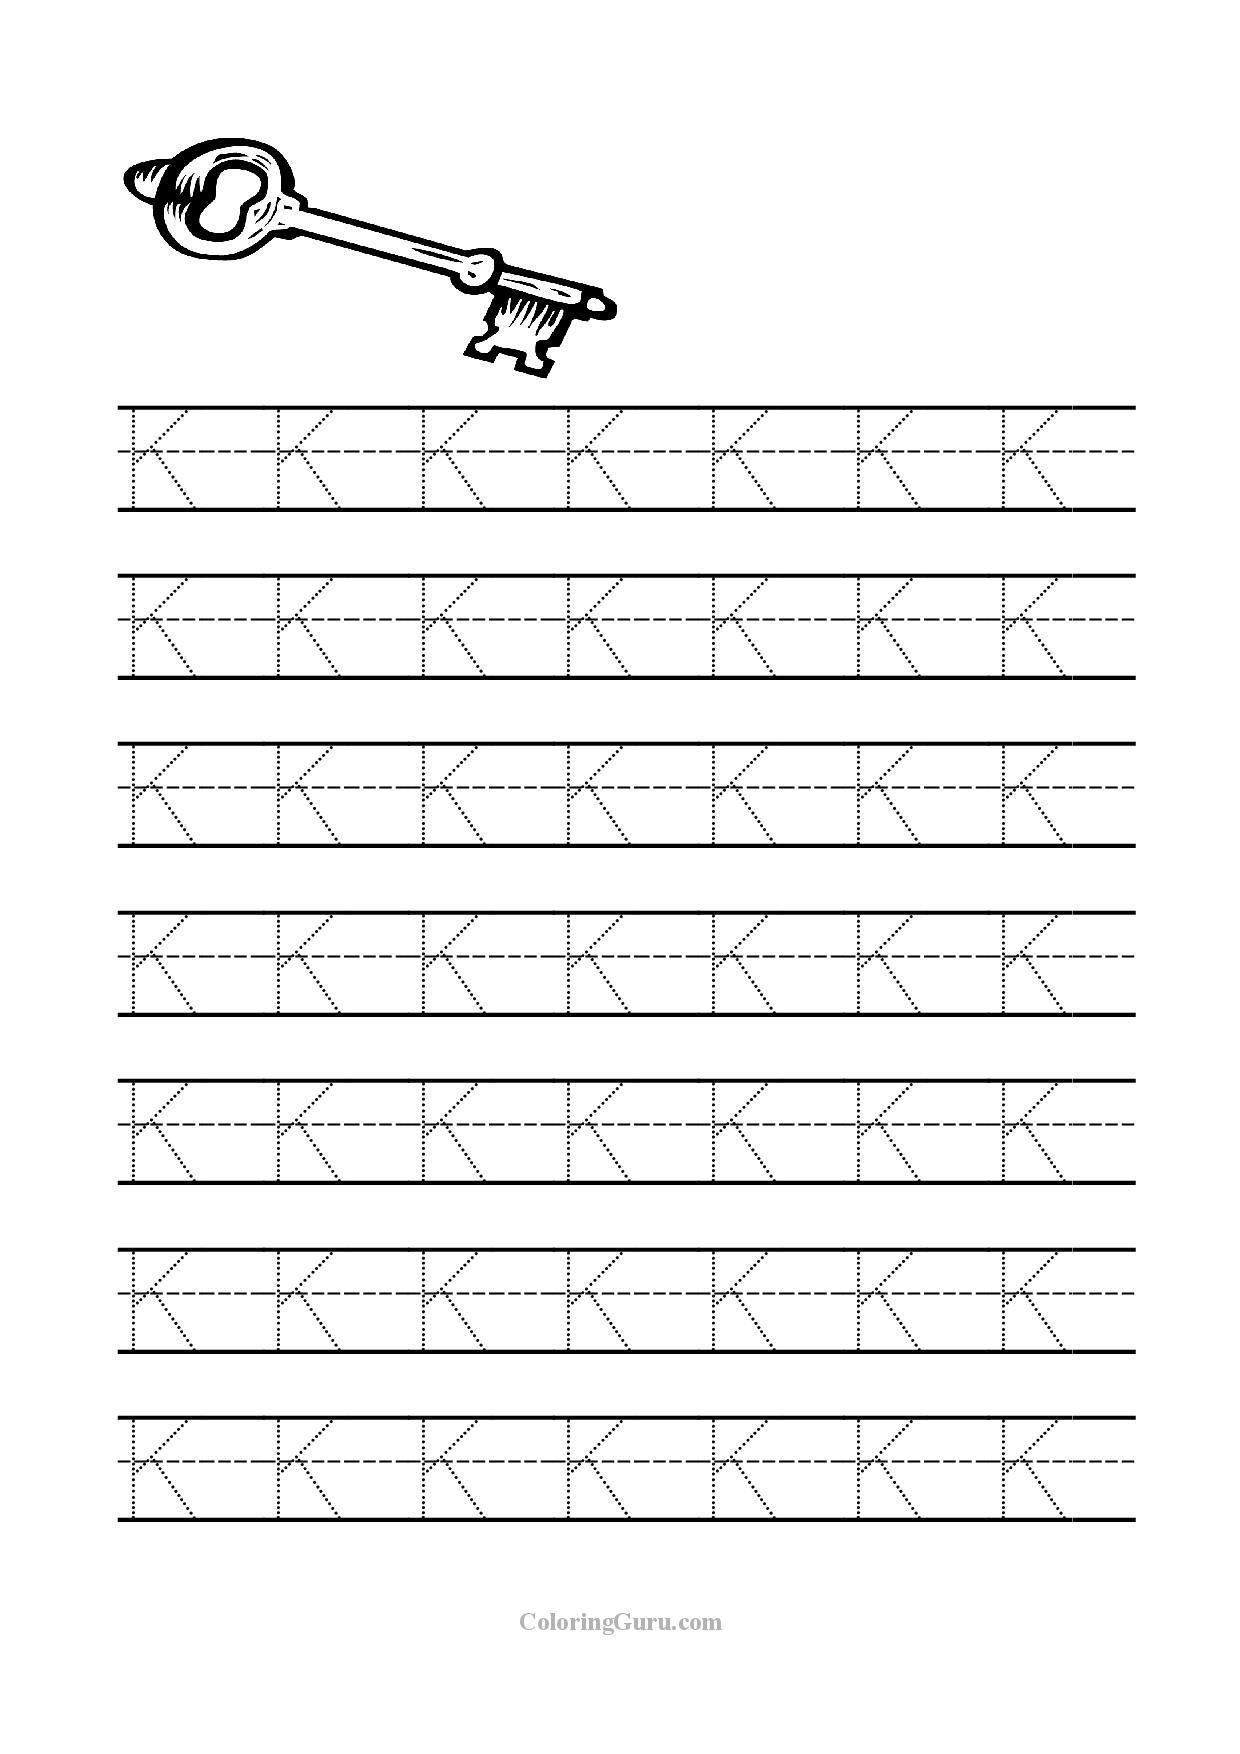 Free Printable Tracing Letter K Worksheets For Preschool regarding Tracing Letter K Worksheets